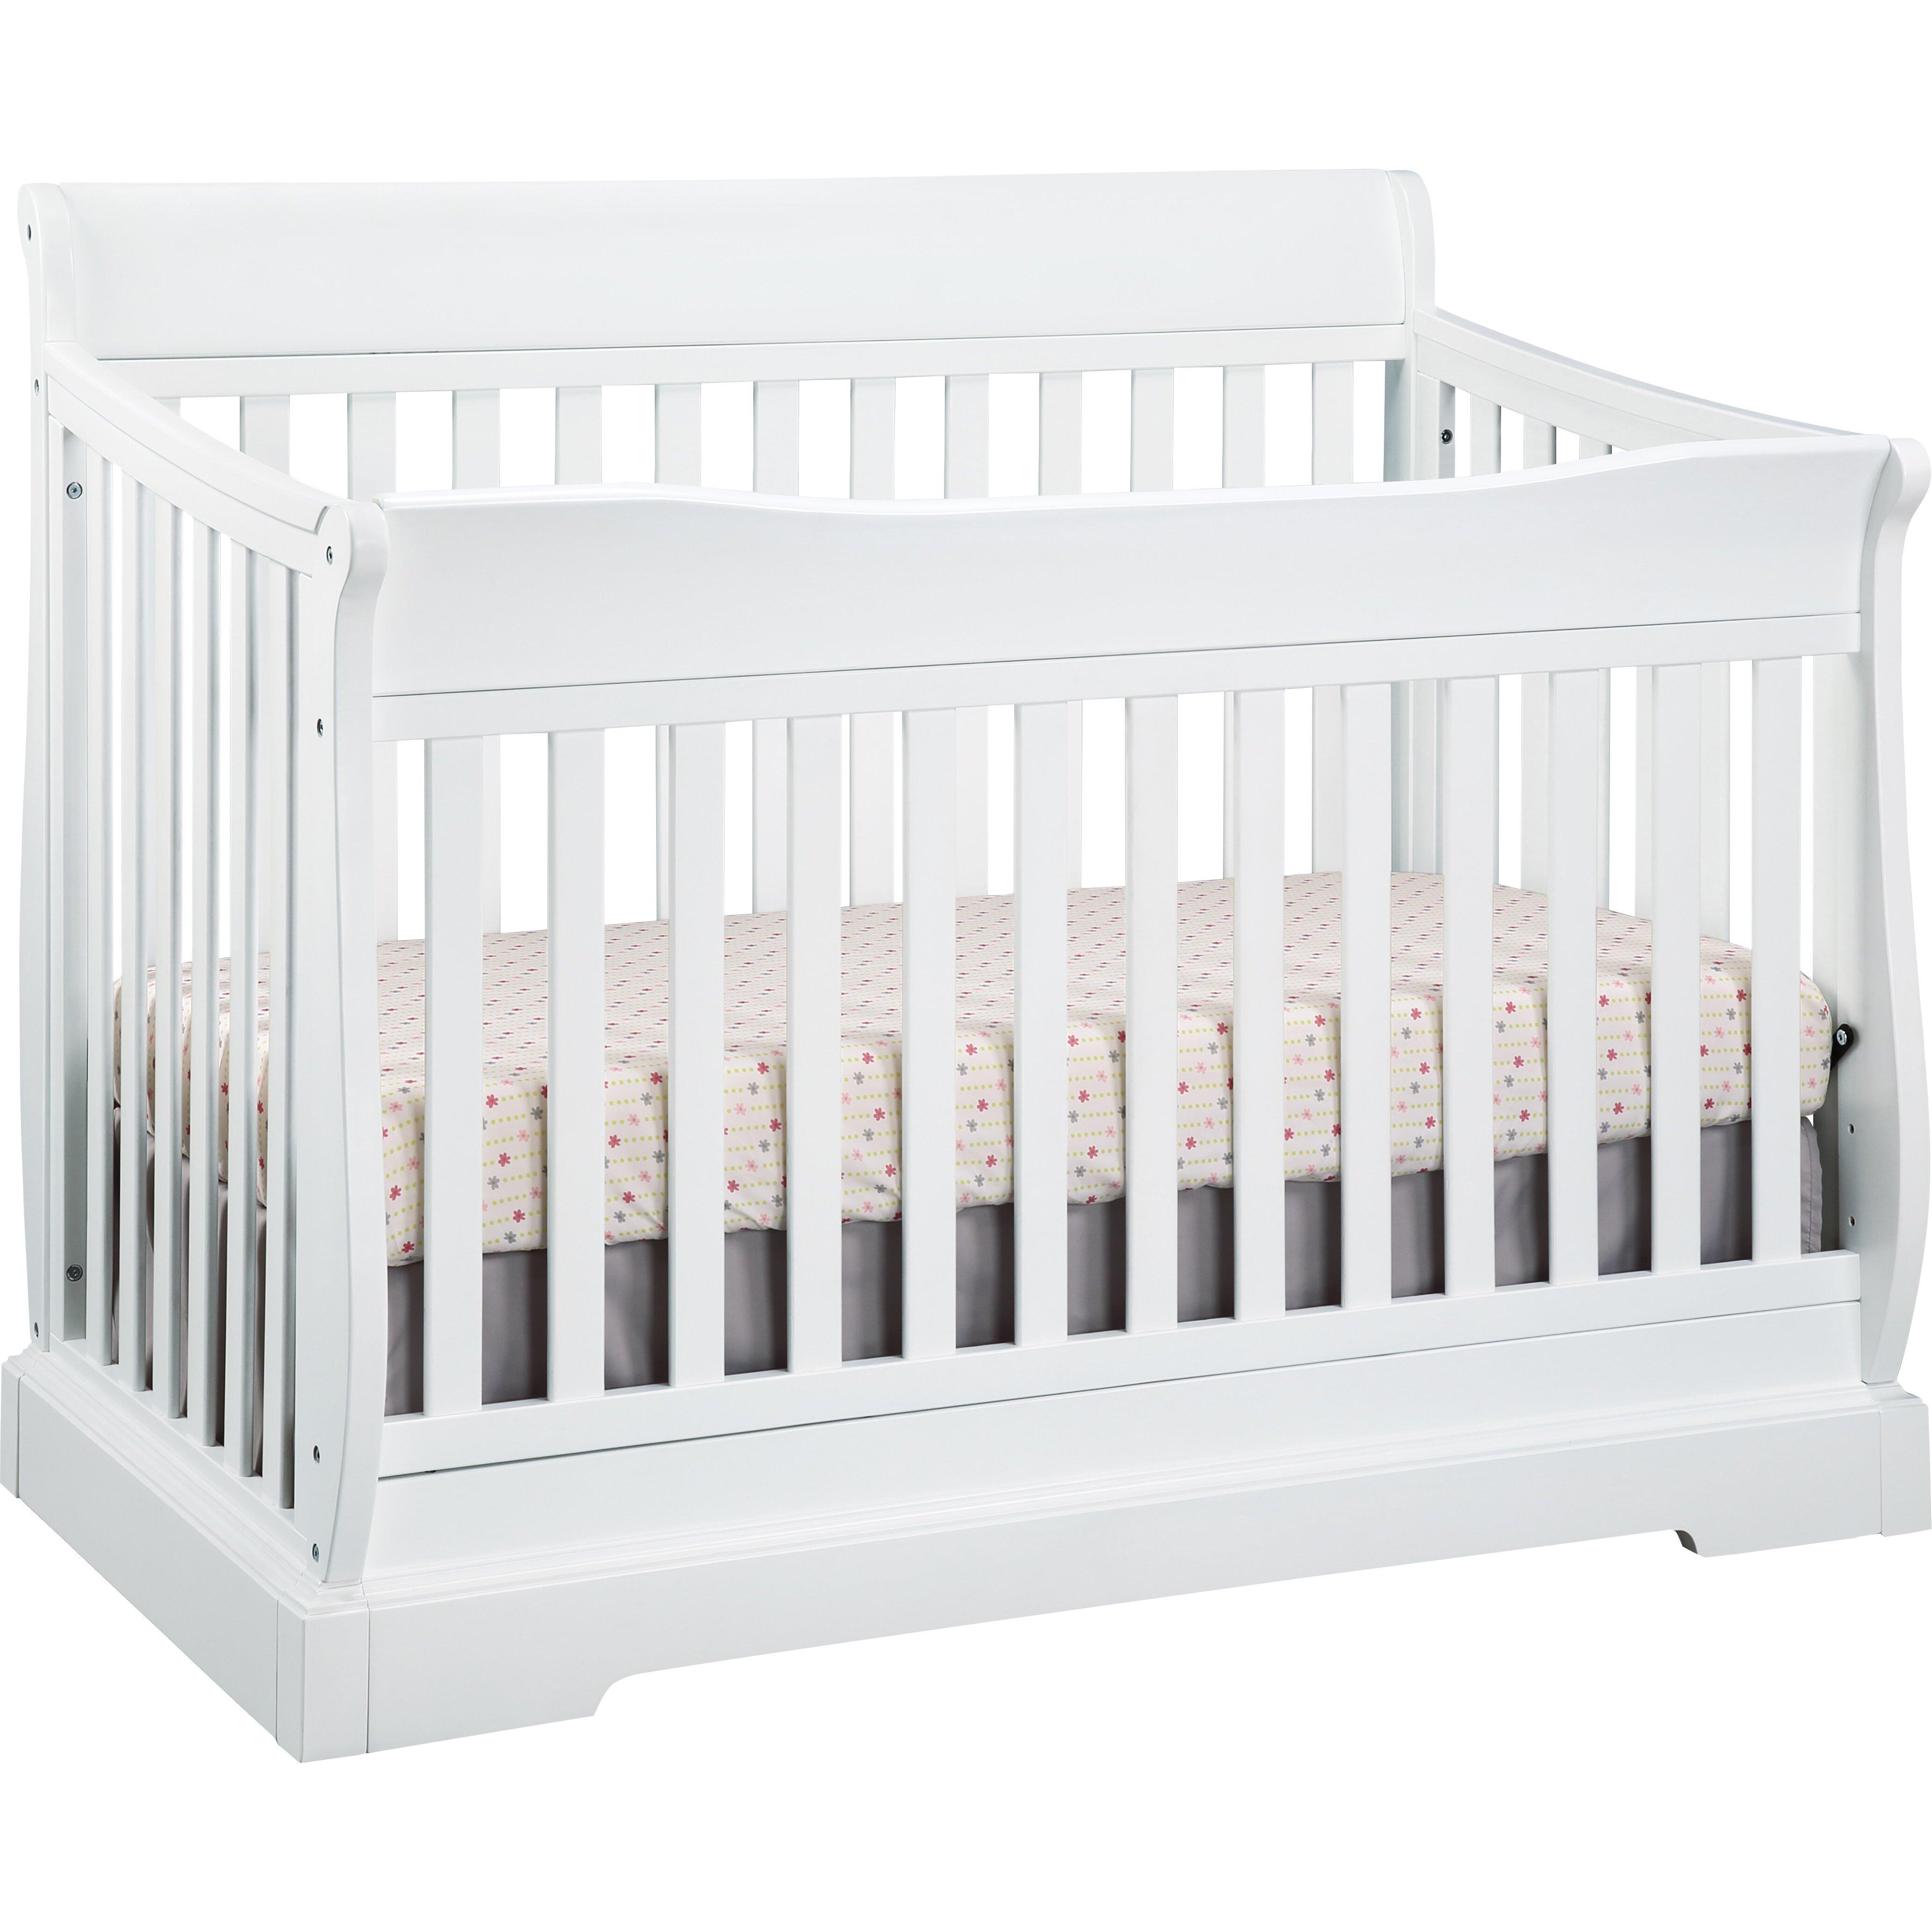 Crib for sale san diego - Graco Maple Ridge 4 In 1 Convertible Crib